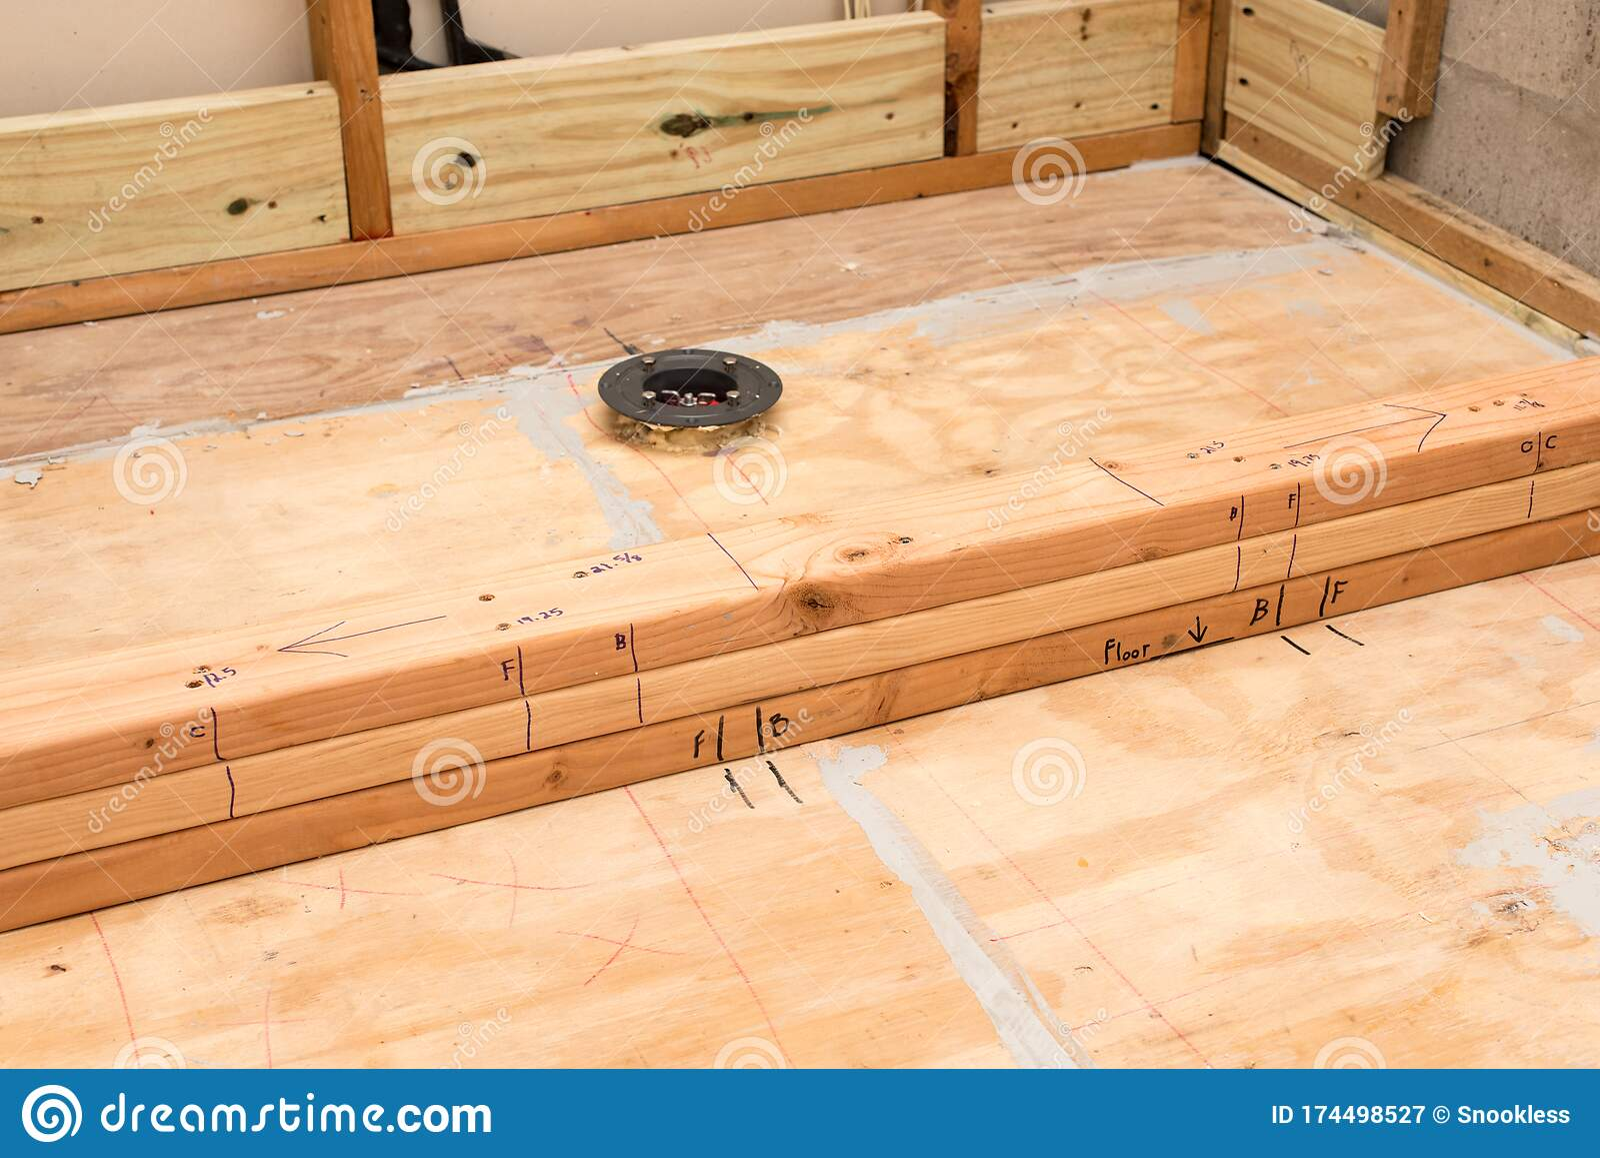 https www dreamstime com installation new shower drain subflooring new curb installation bathroom remodel new shower floor drain image174498527